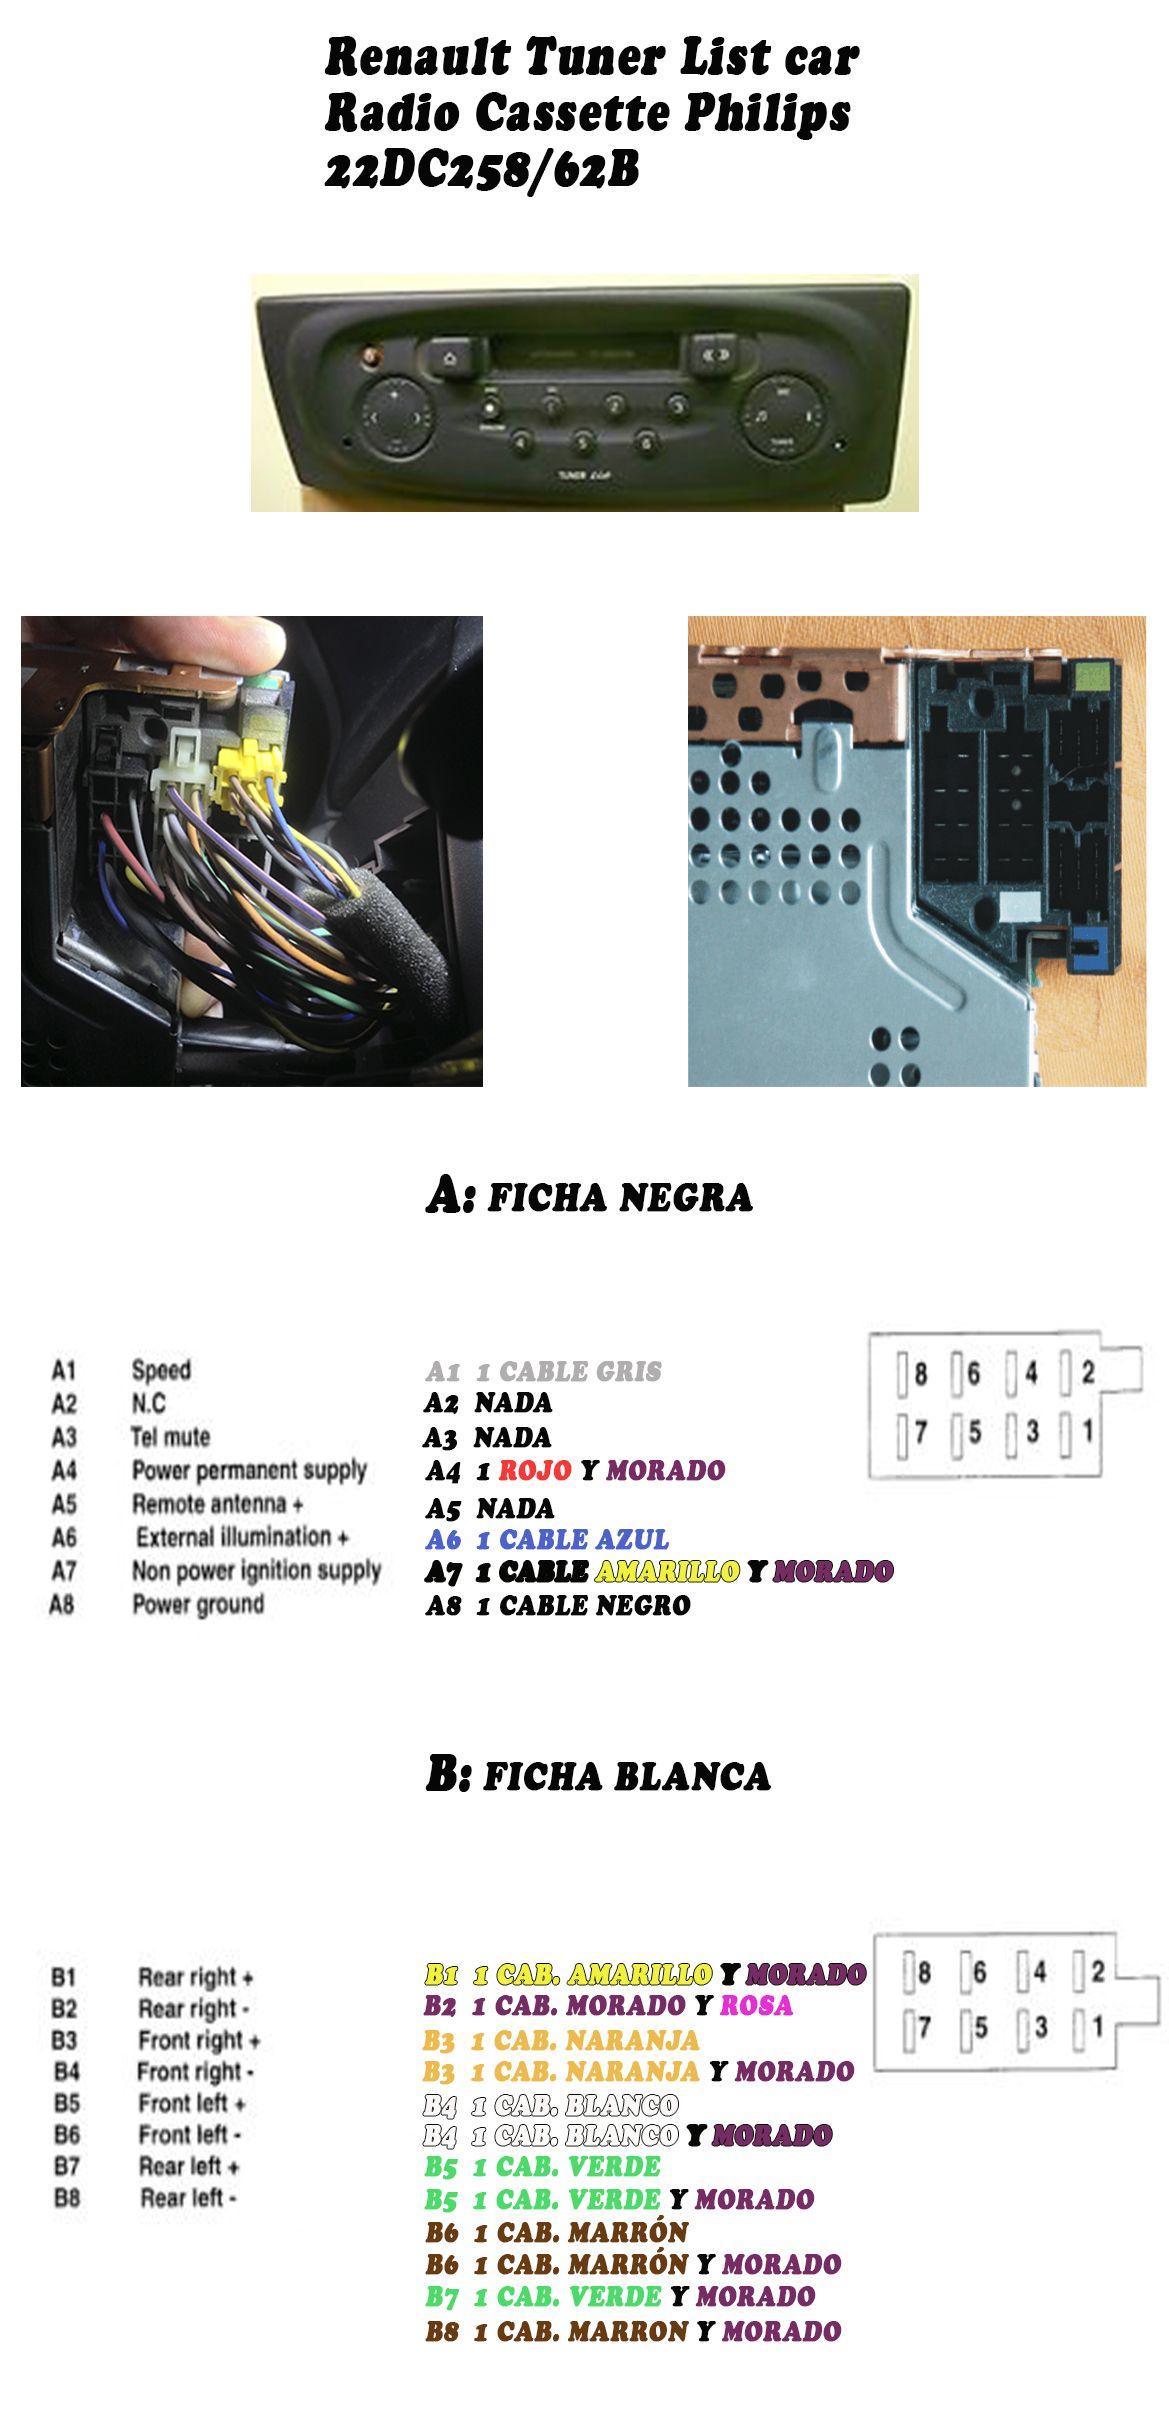 Esquema Del Cableado De Renault Megane 1  A U00f1o 2000  Radio Cassette Philips